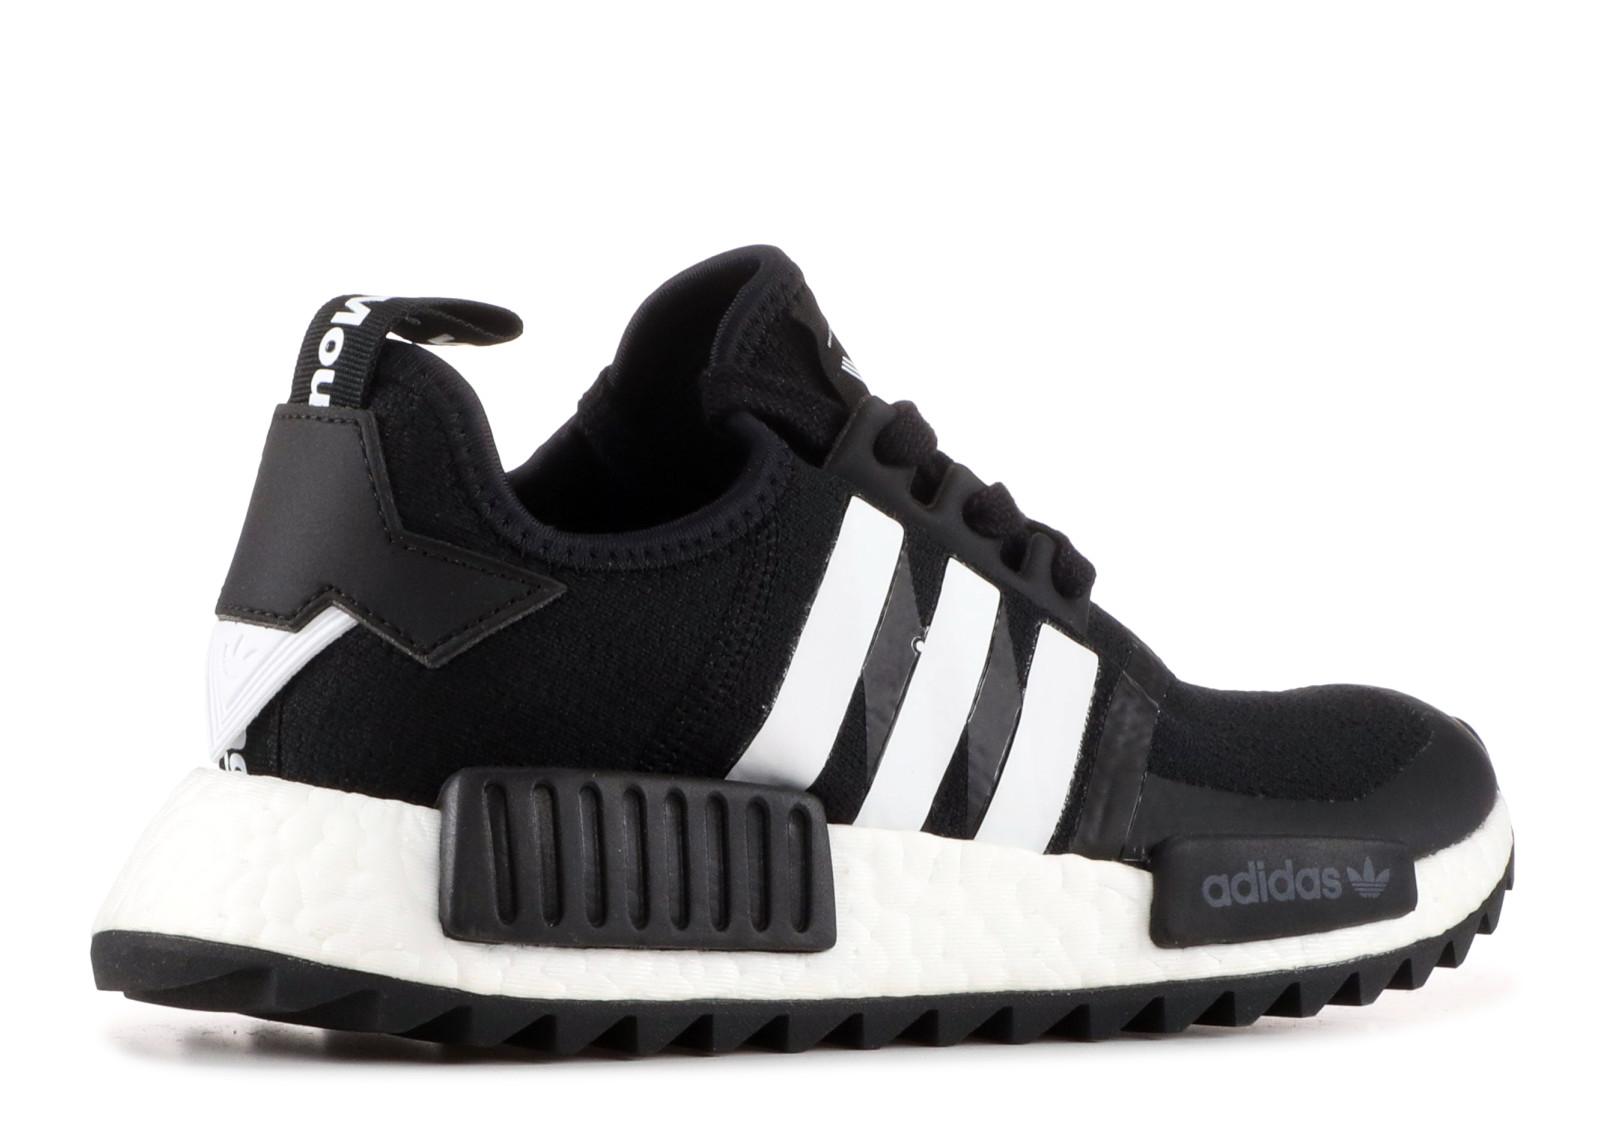 on sale 091ca 0e2cd Kick Avenue - Authentic Sneakers